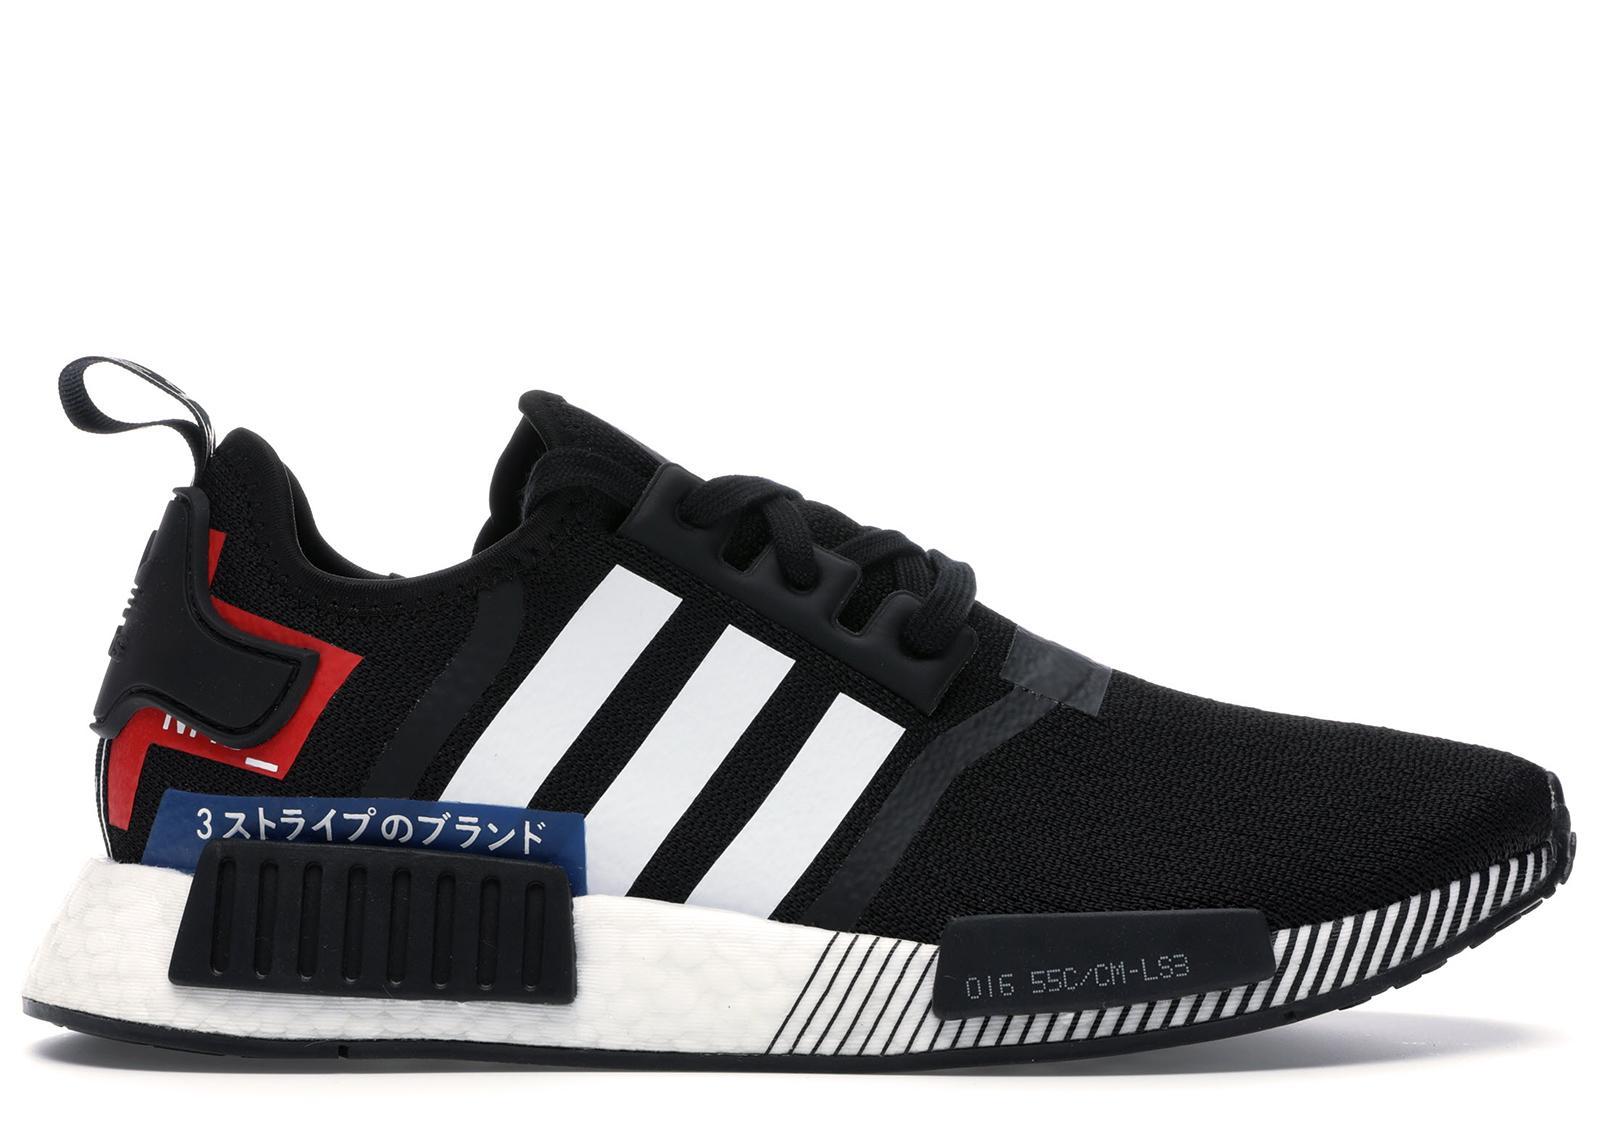 Adidas Nmd R1 Japan Pack Black White 2019 For Men Lyst